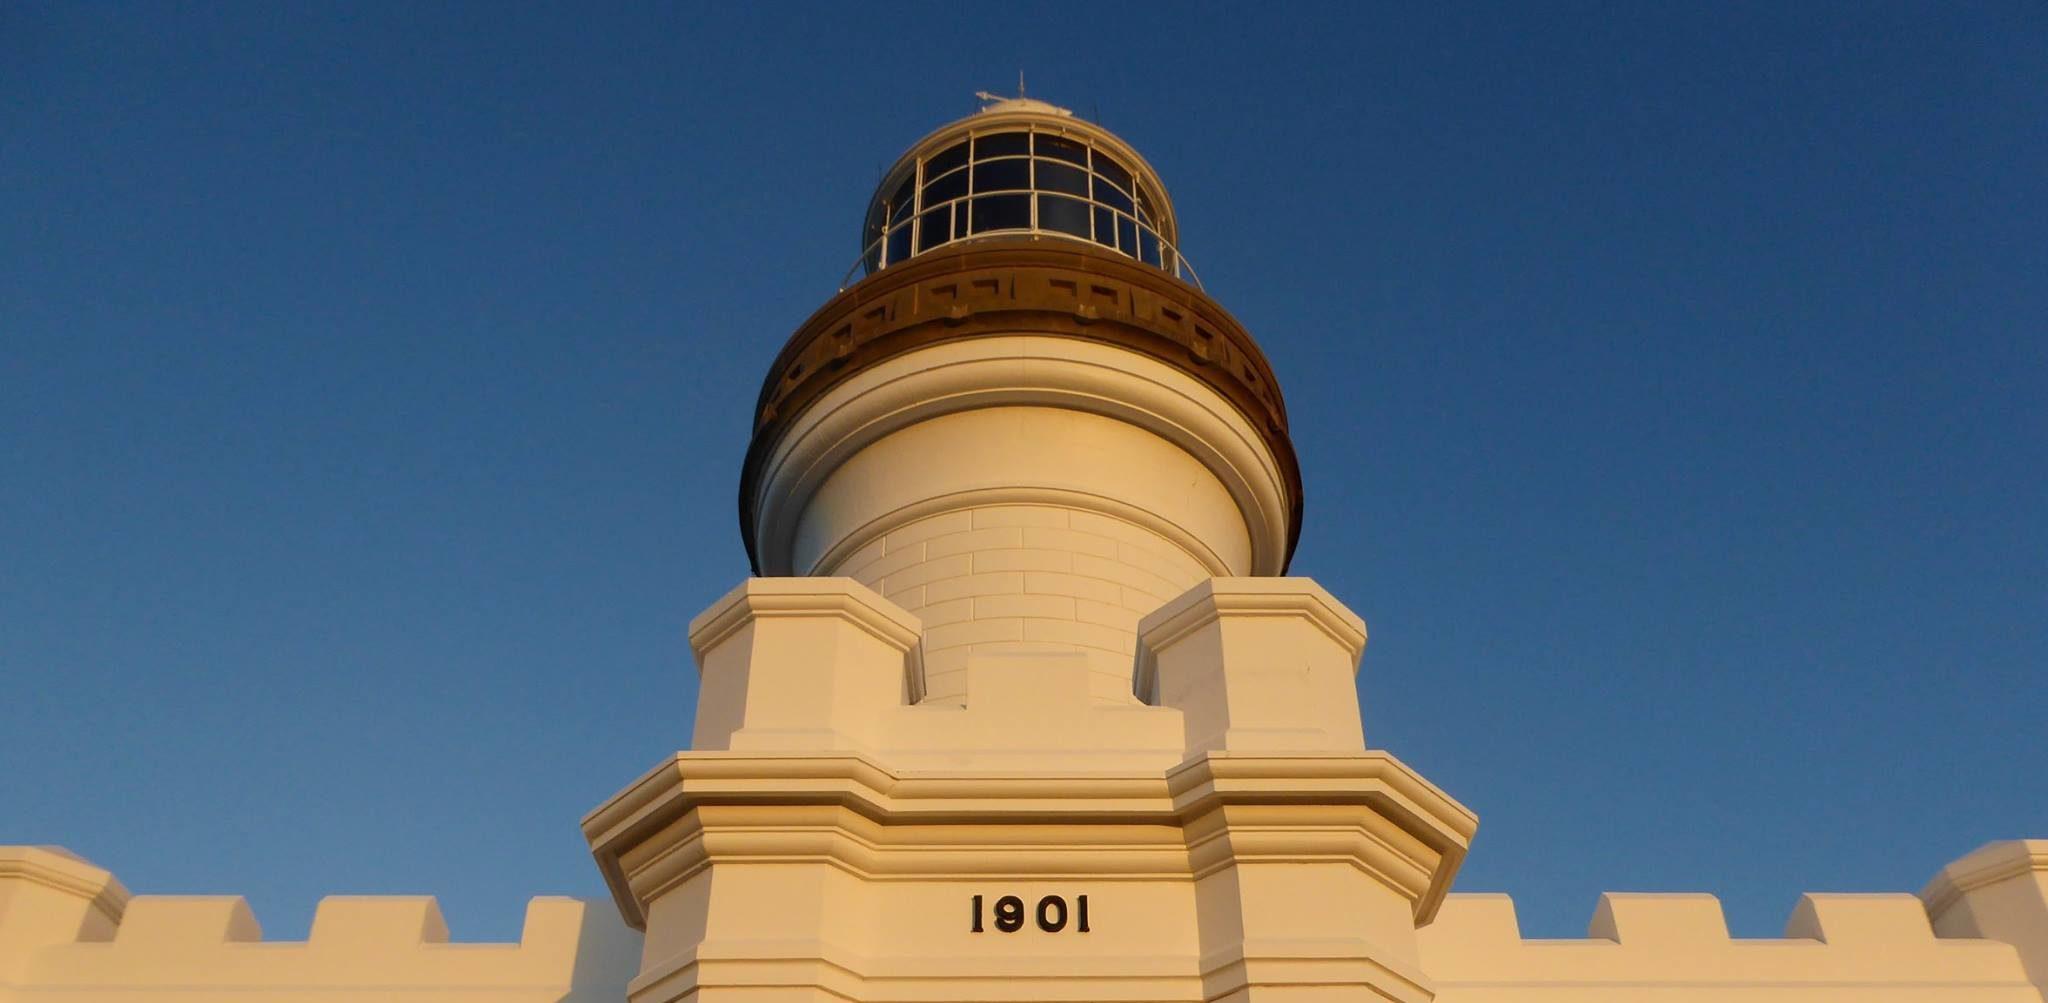 byron bay lifestyle lighthouse